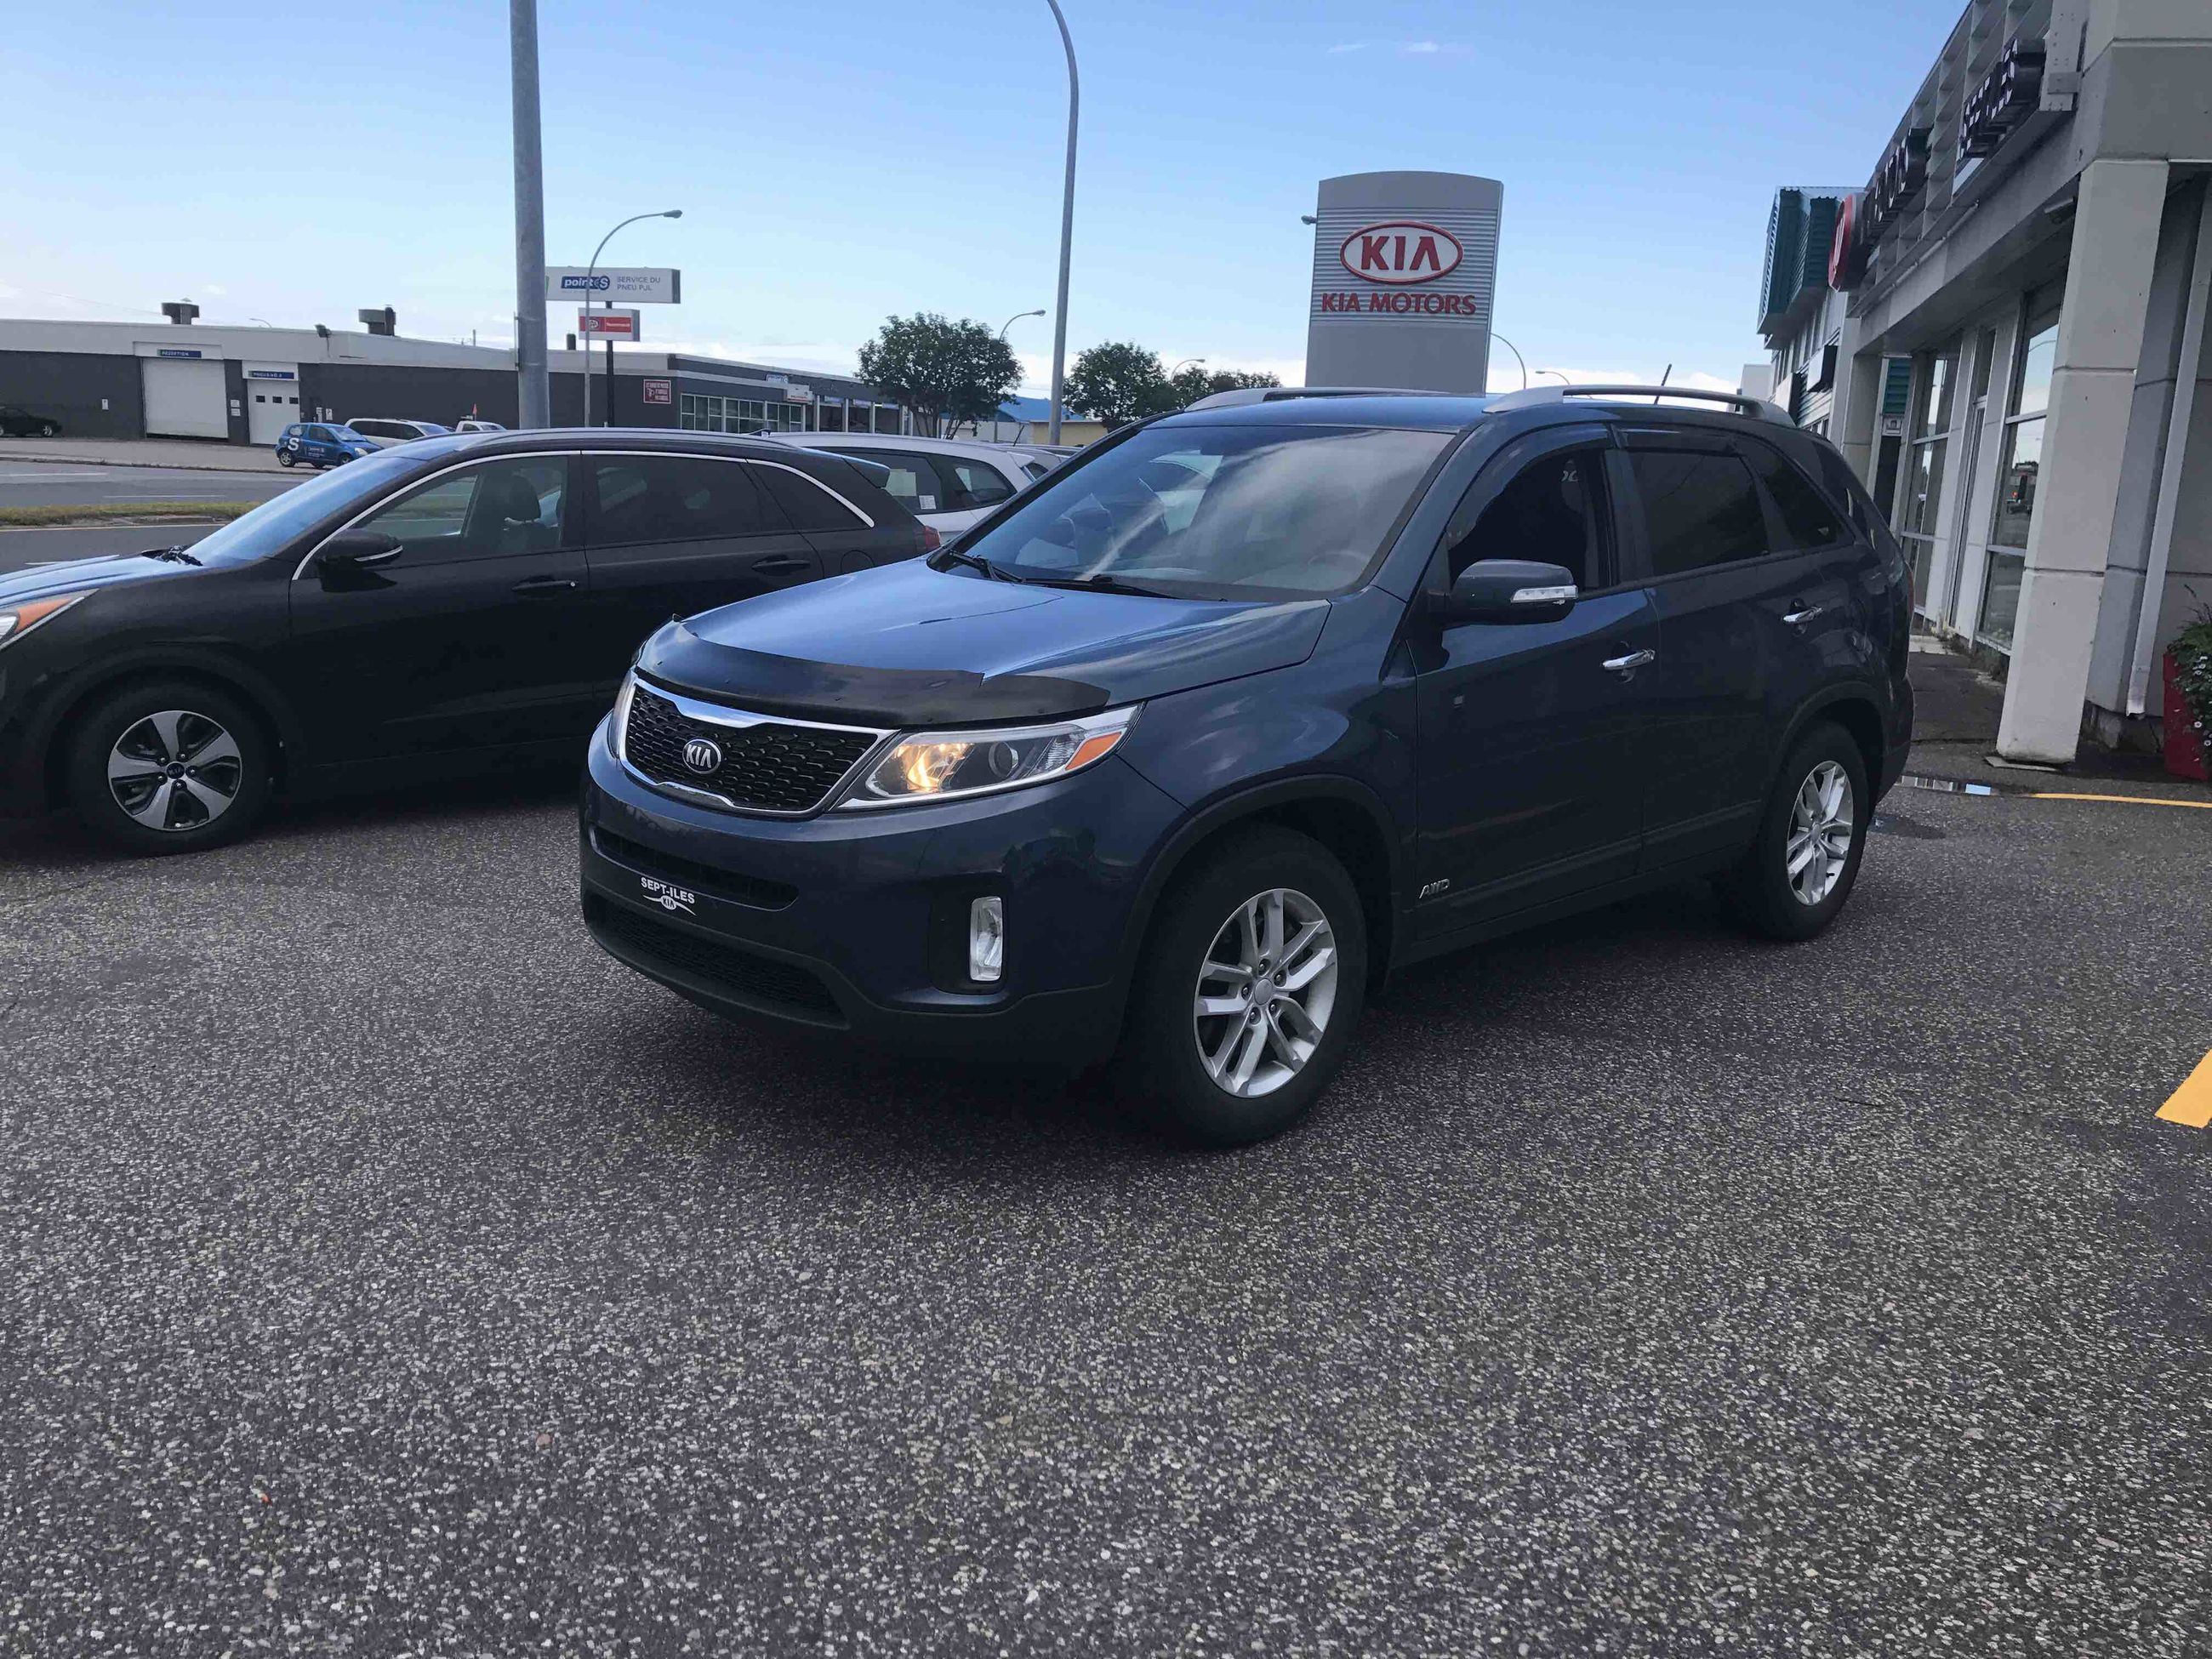 inventory kia in sale for lx used vehicle iles en sorento sept awd quebec